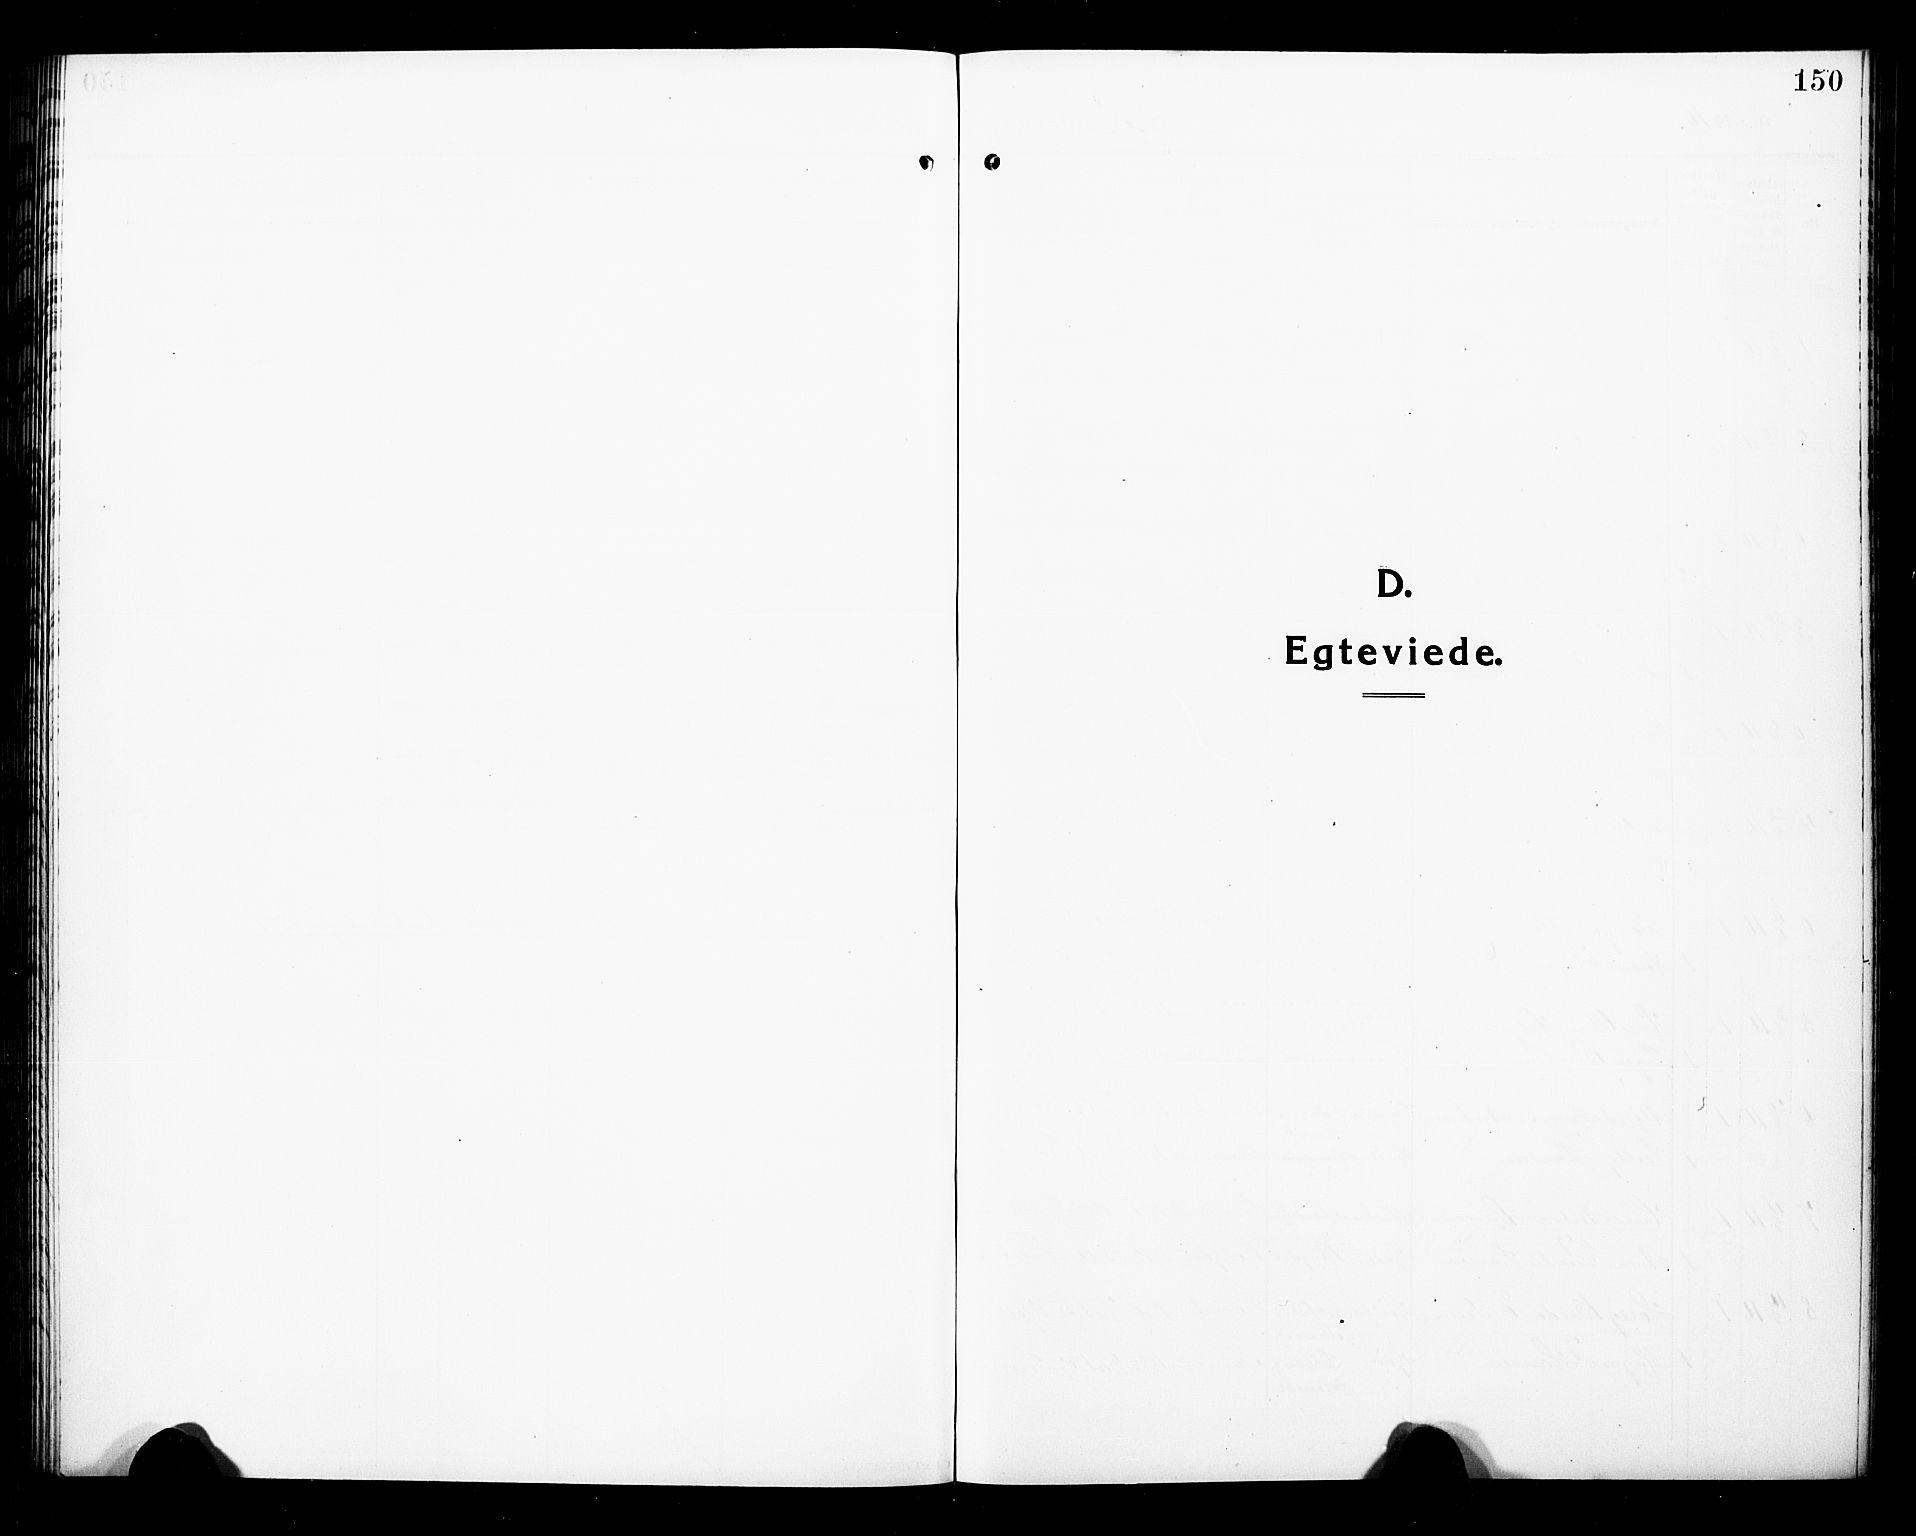 SAKO, Hedrum kirkebøker, G/Ga/L0005: Klokkerbok nr. I 5, 1916-1930, s. 150